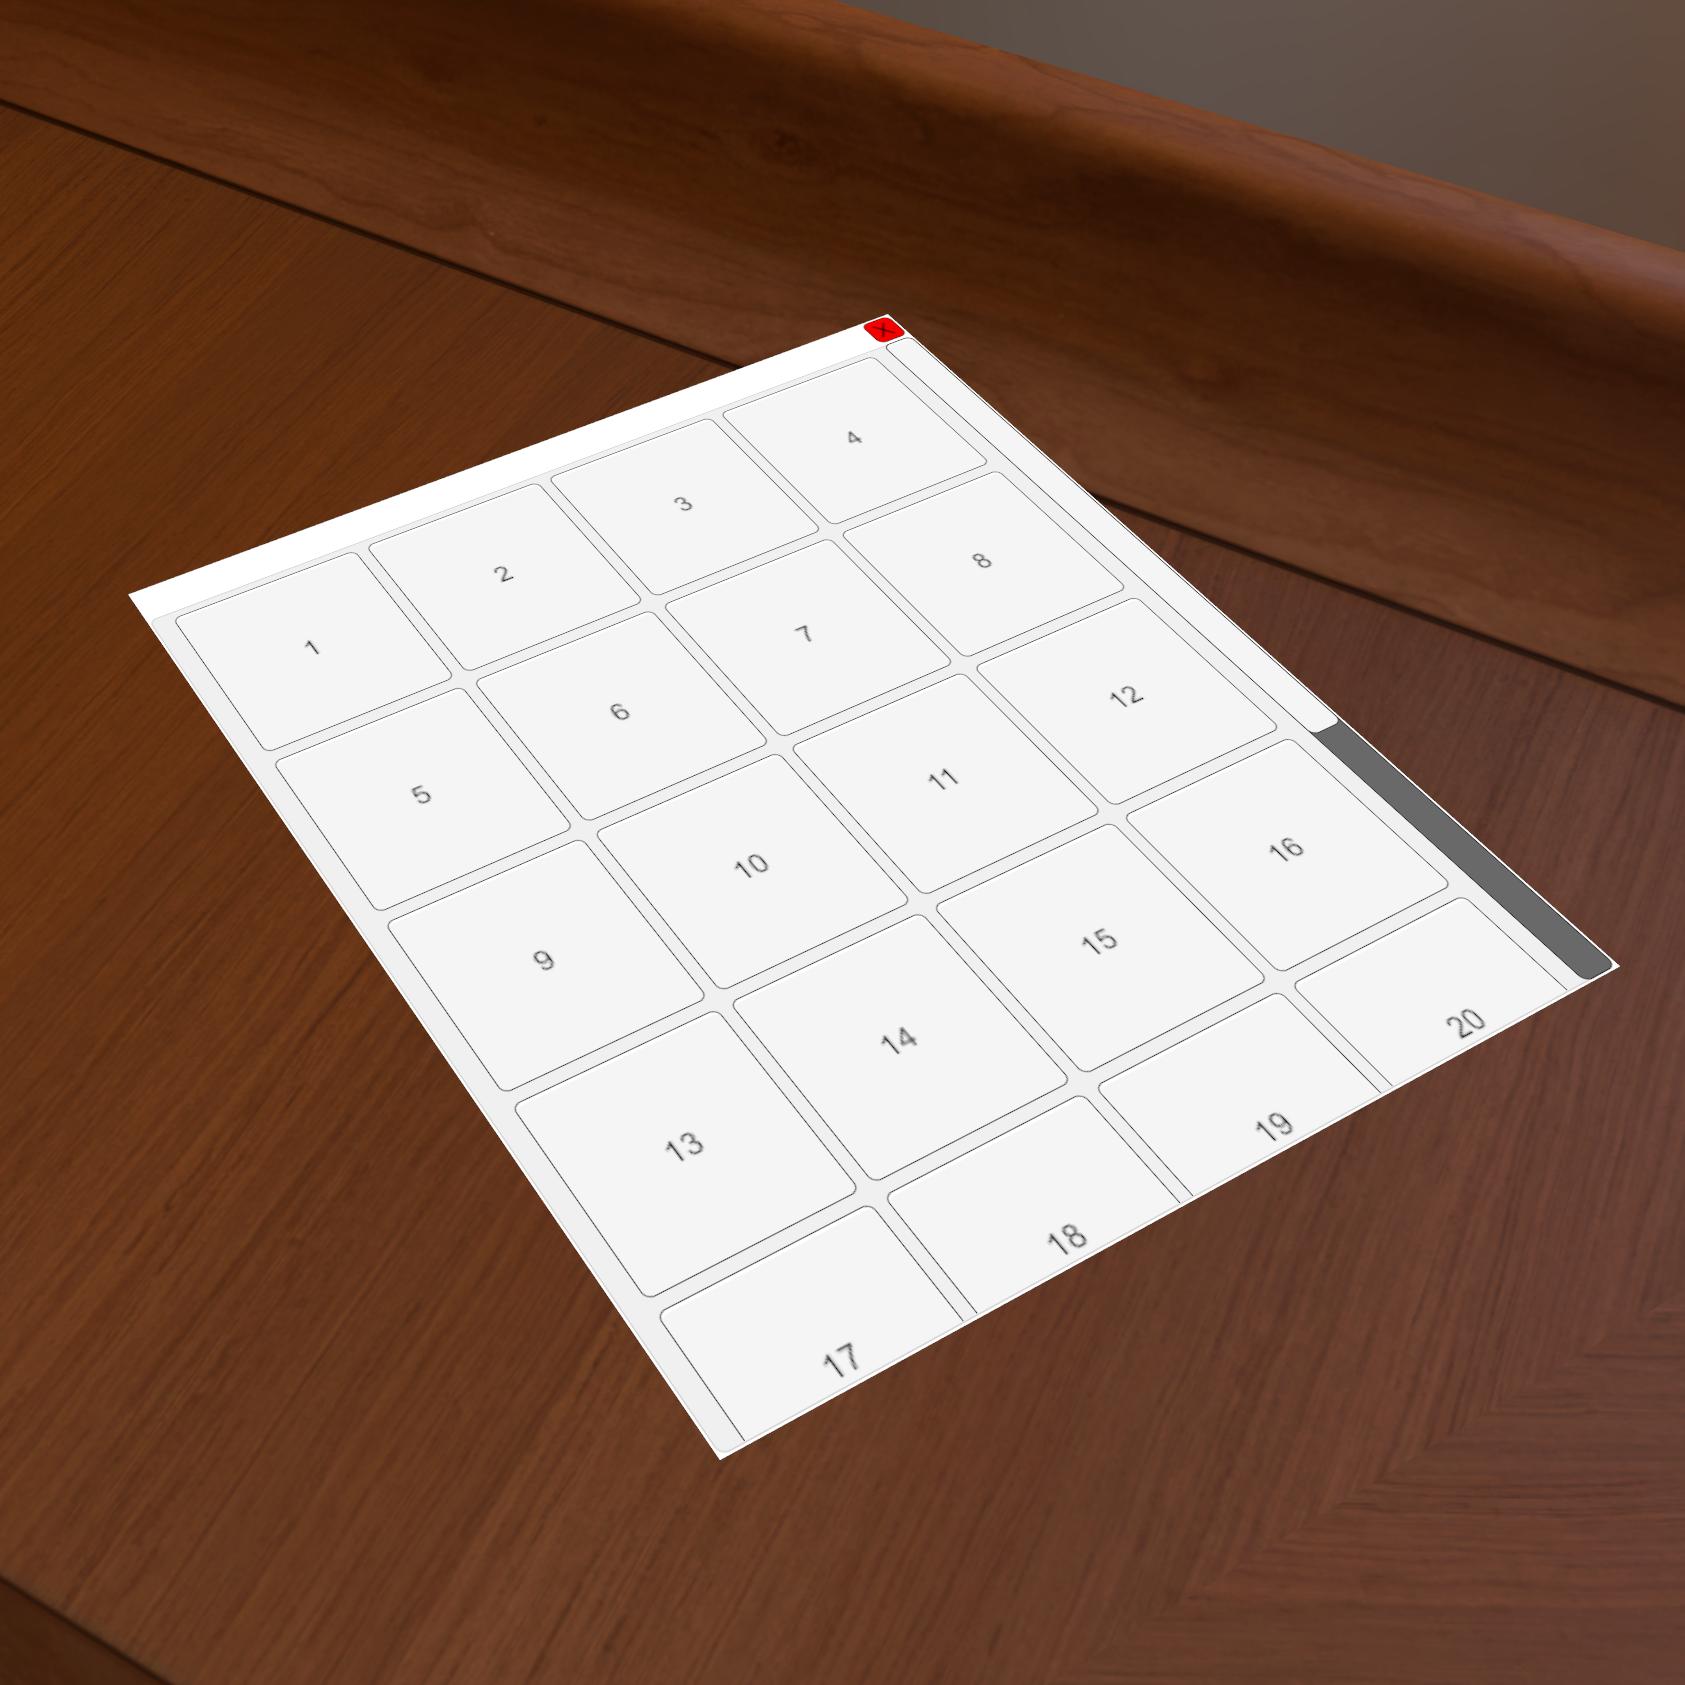 Tabletop Simulator :: Update v10 6 Custom 3D UI, VR improvements